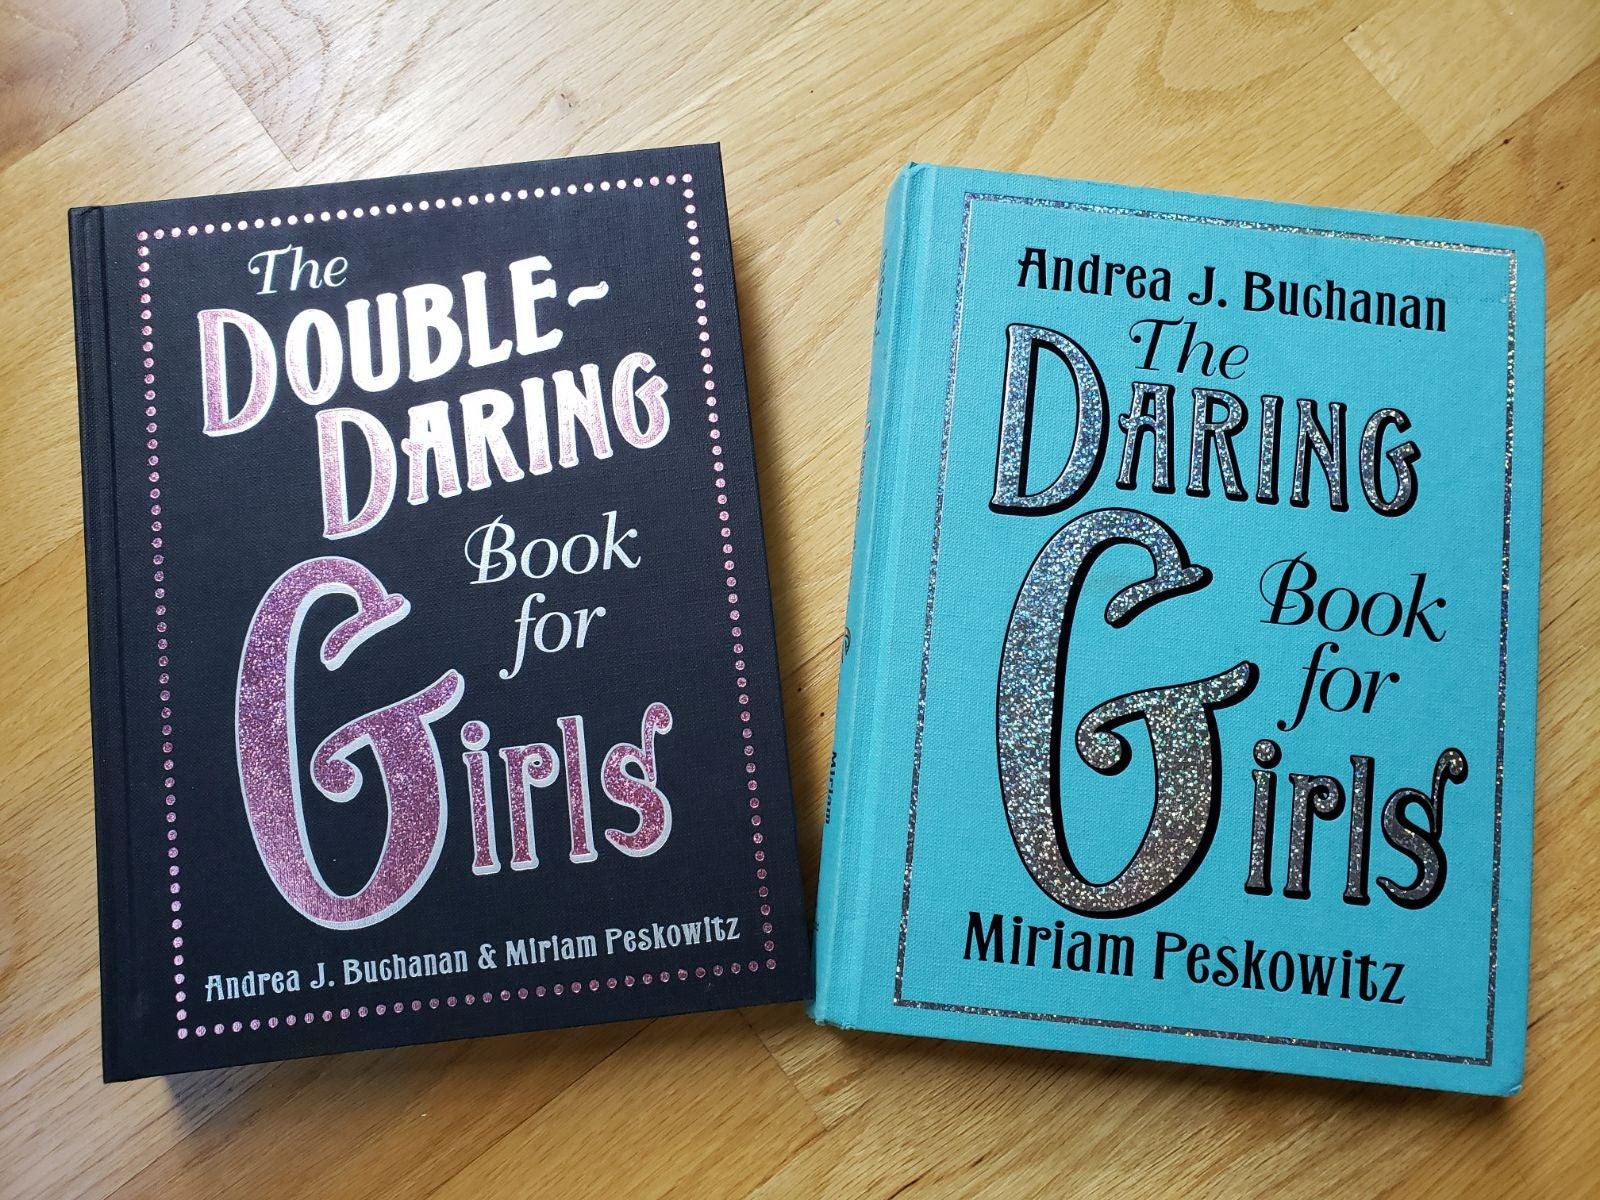 Set of Daring Girls Books